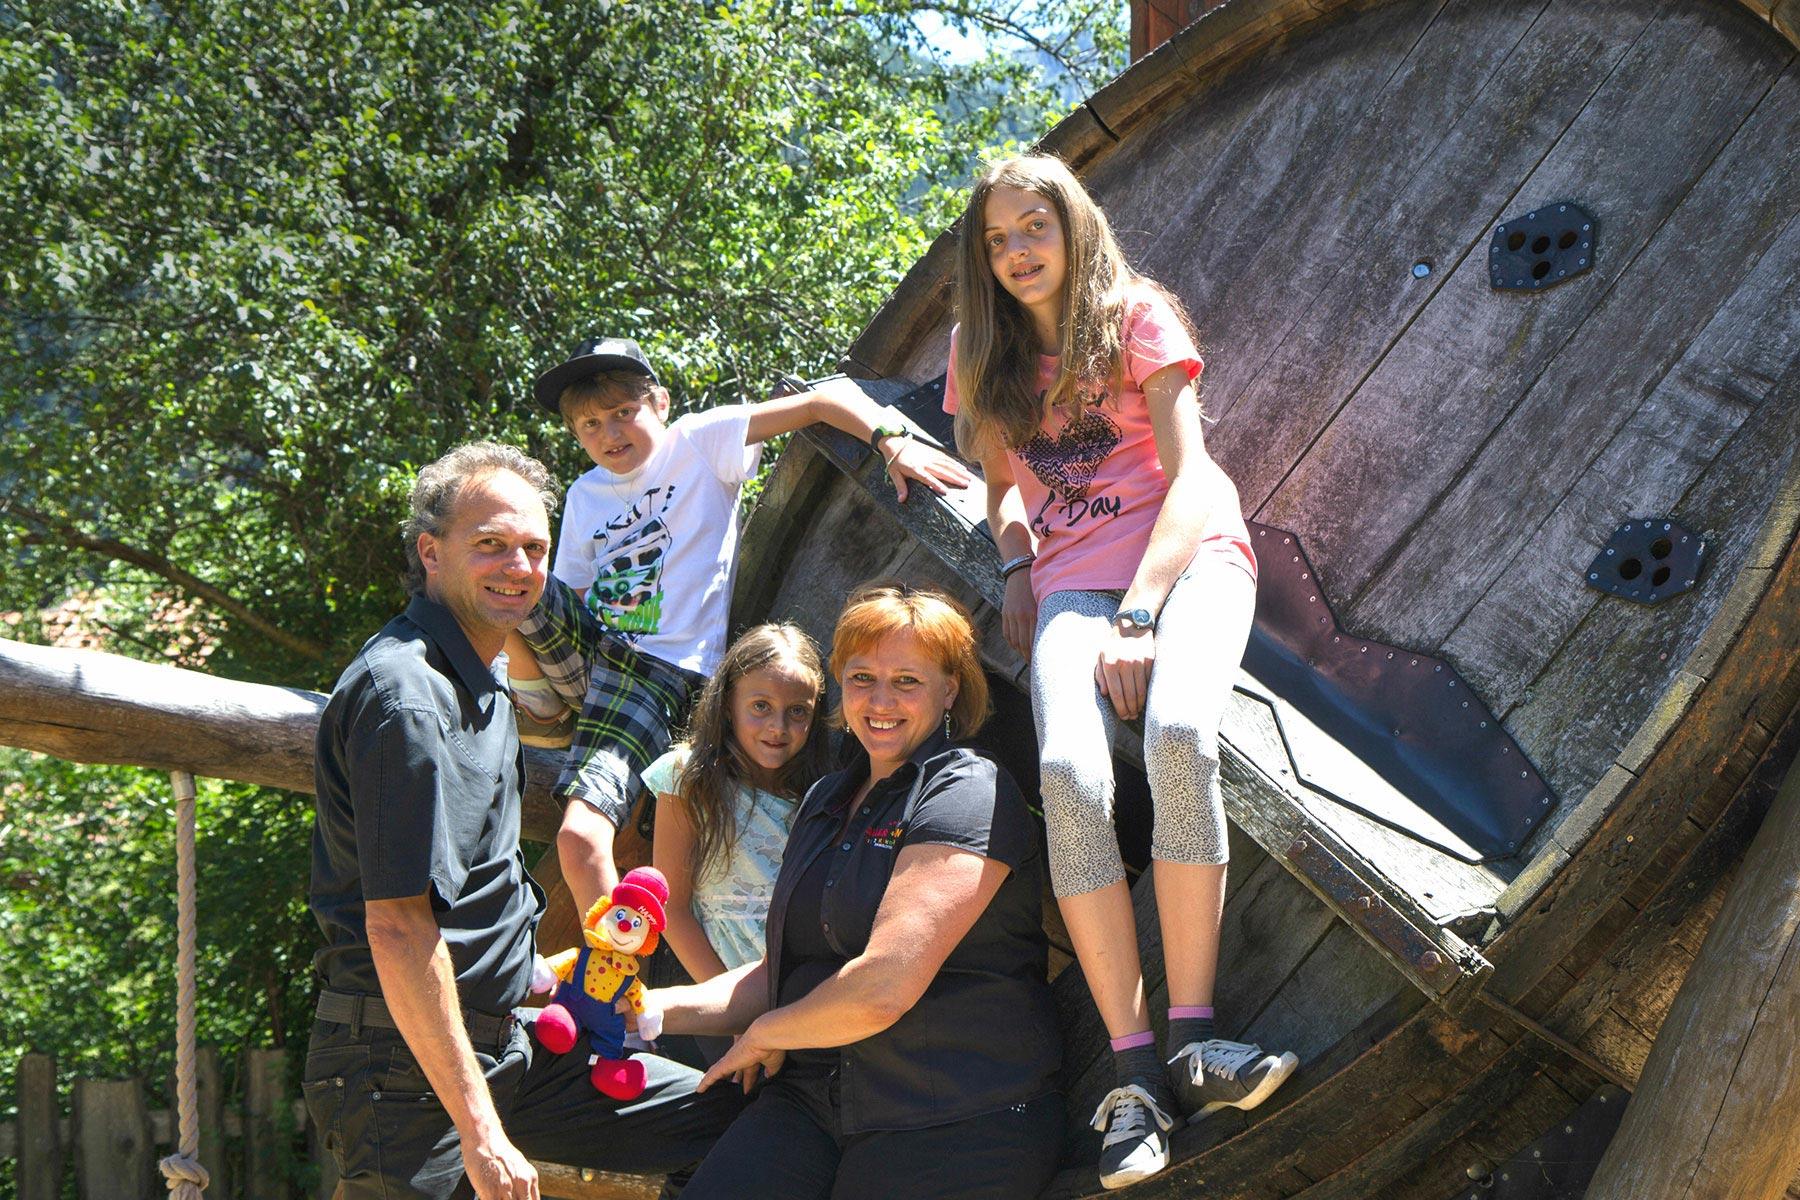 http://sailer-und-stefan.at/sites/default/files/revslider/image/Familienfotos_170626-36-1800.jpg